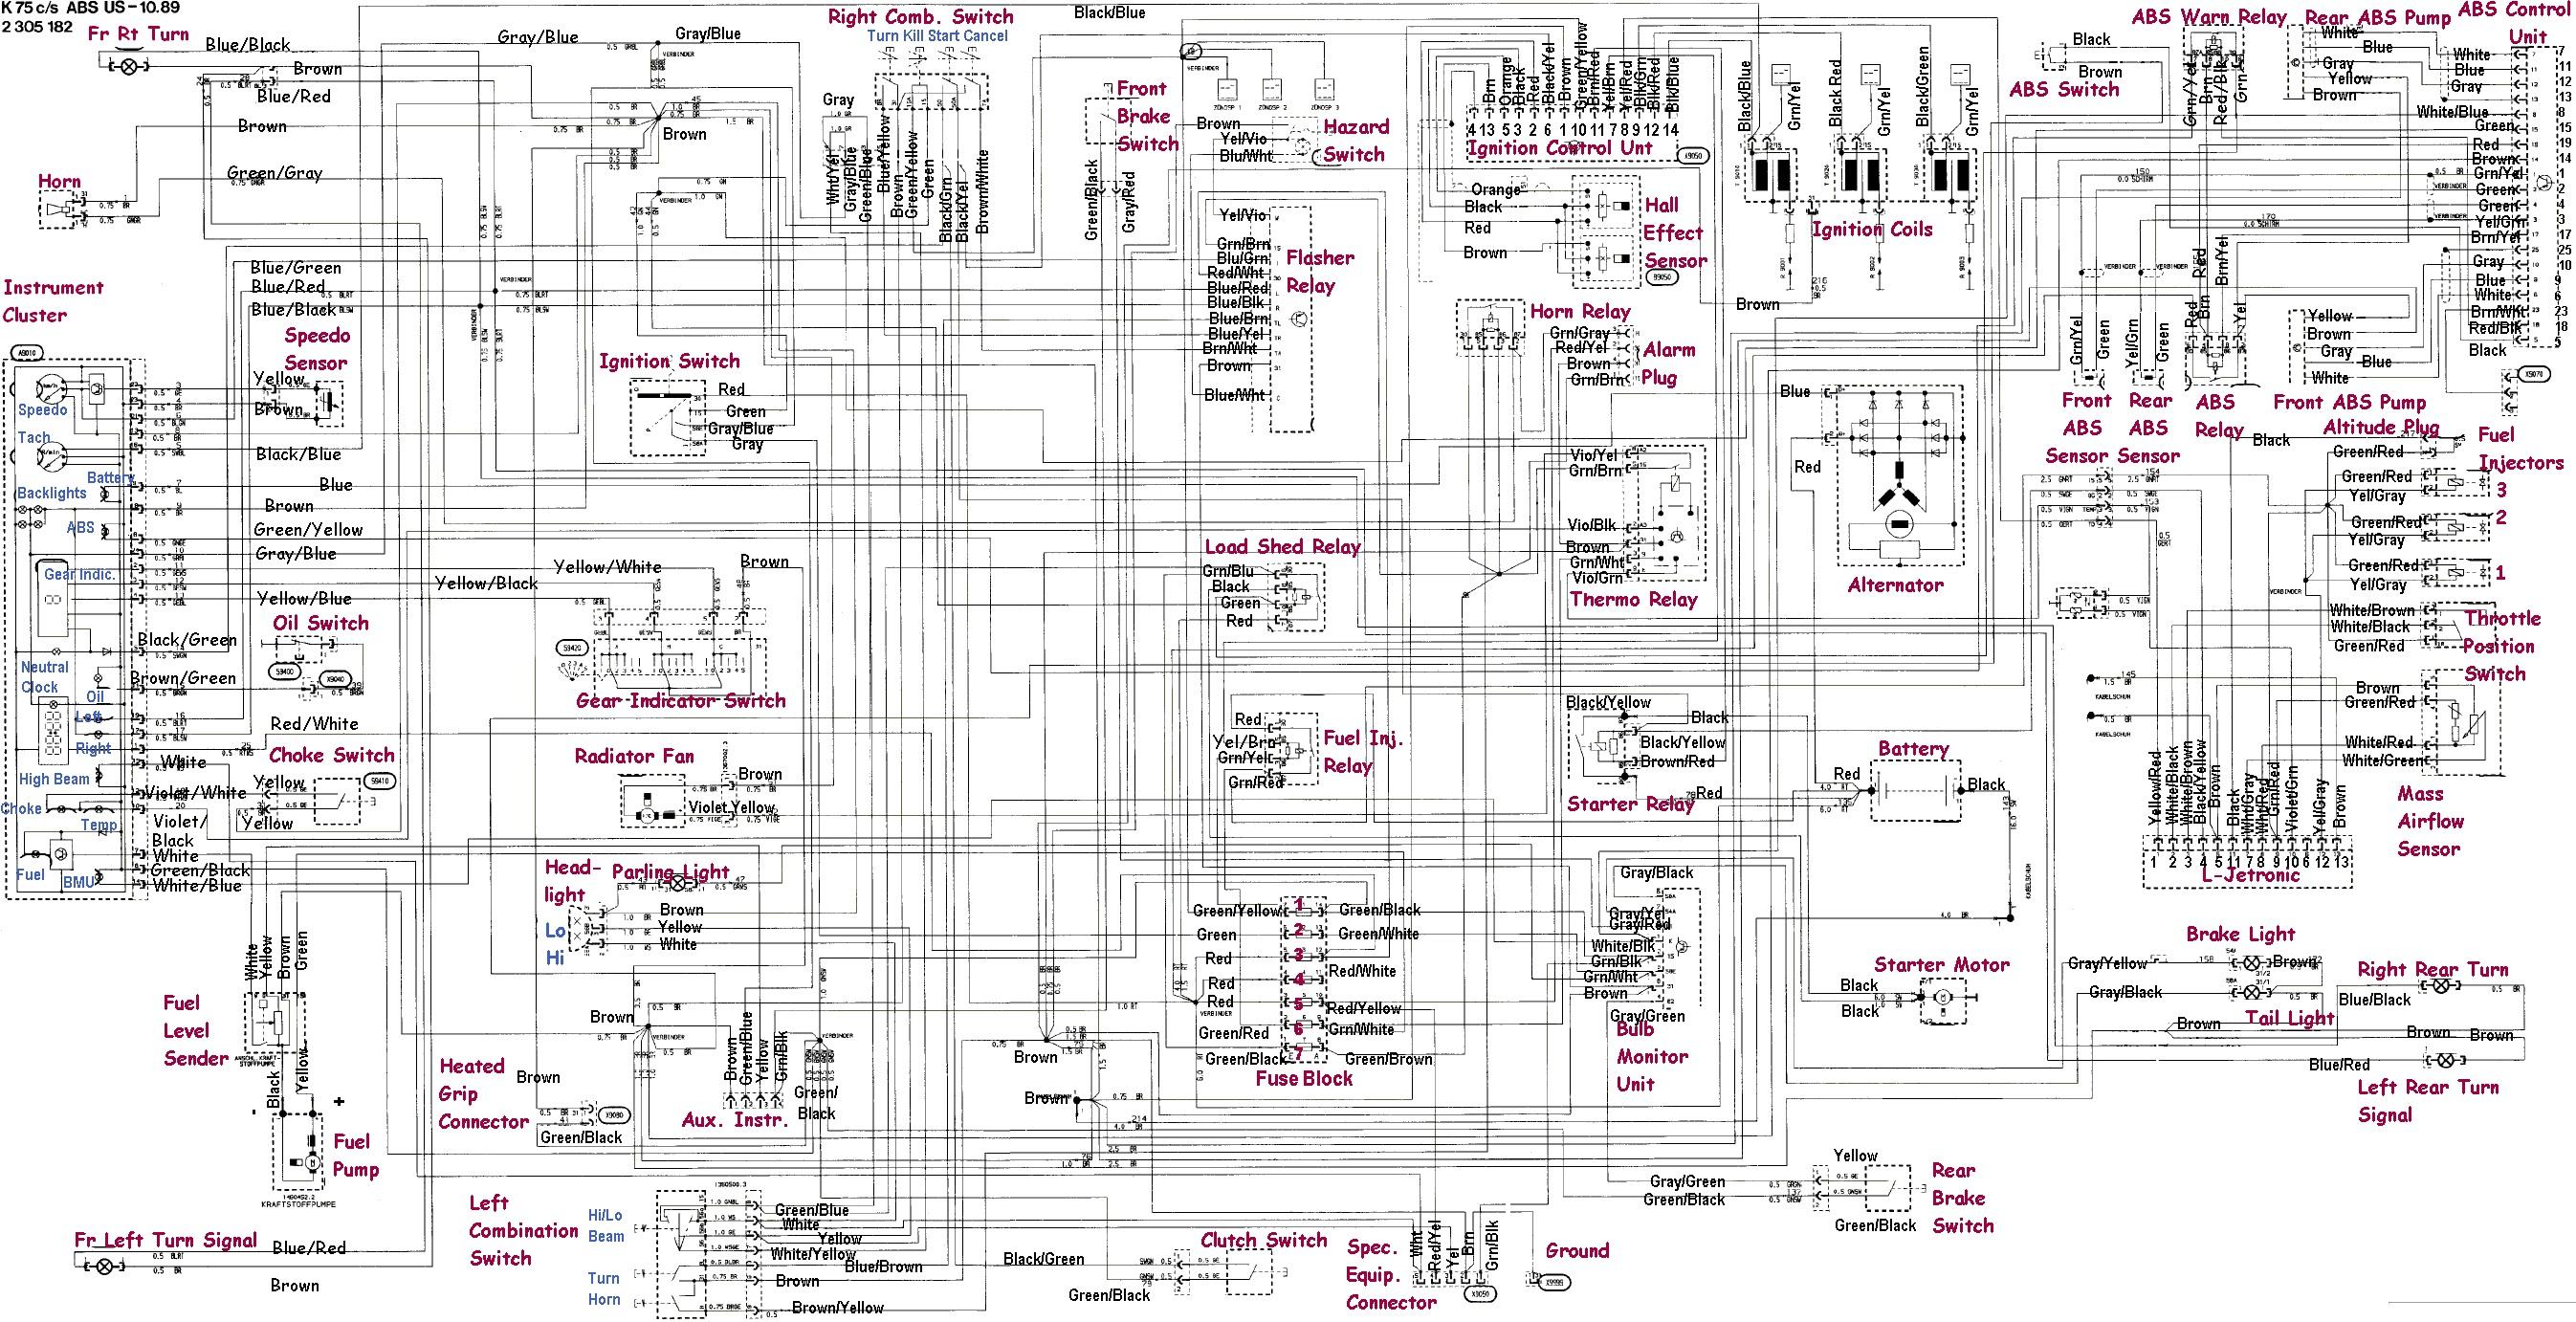 bmw hp4 wiring diagram 2011 bmw wiring diagrams giant fuse9 klictravel nl  2011 bmw wiring diagrams giant fuse9